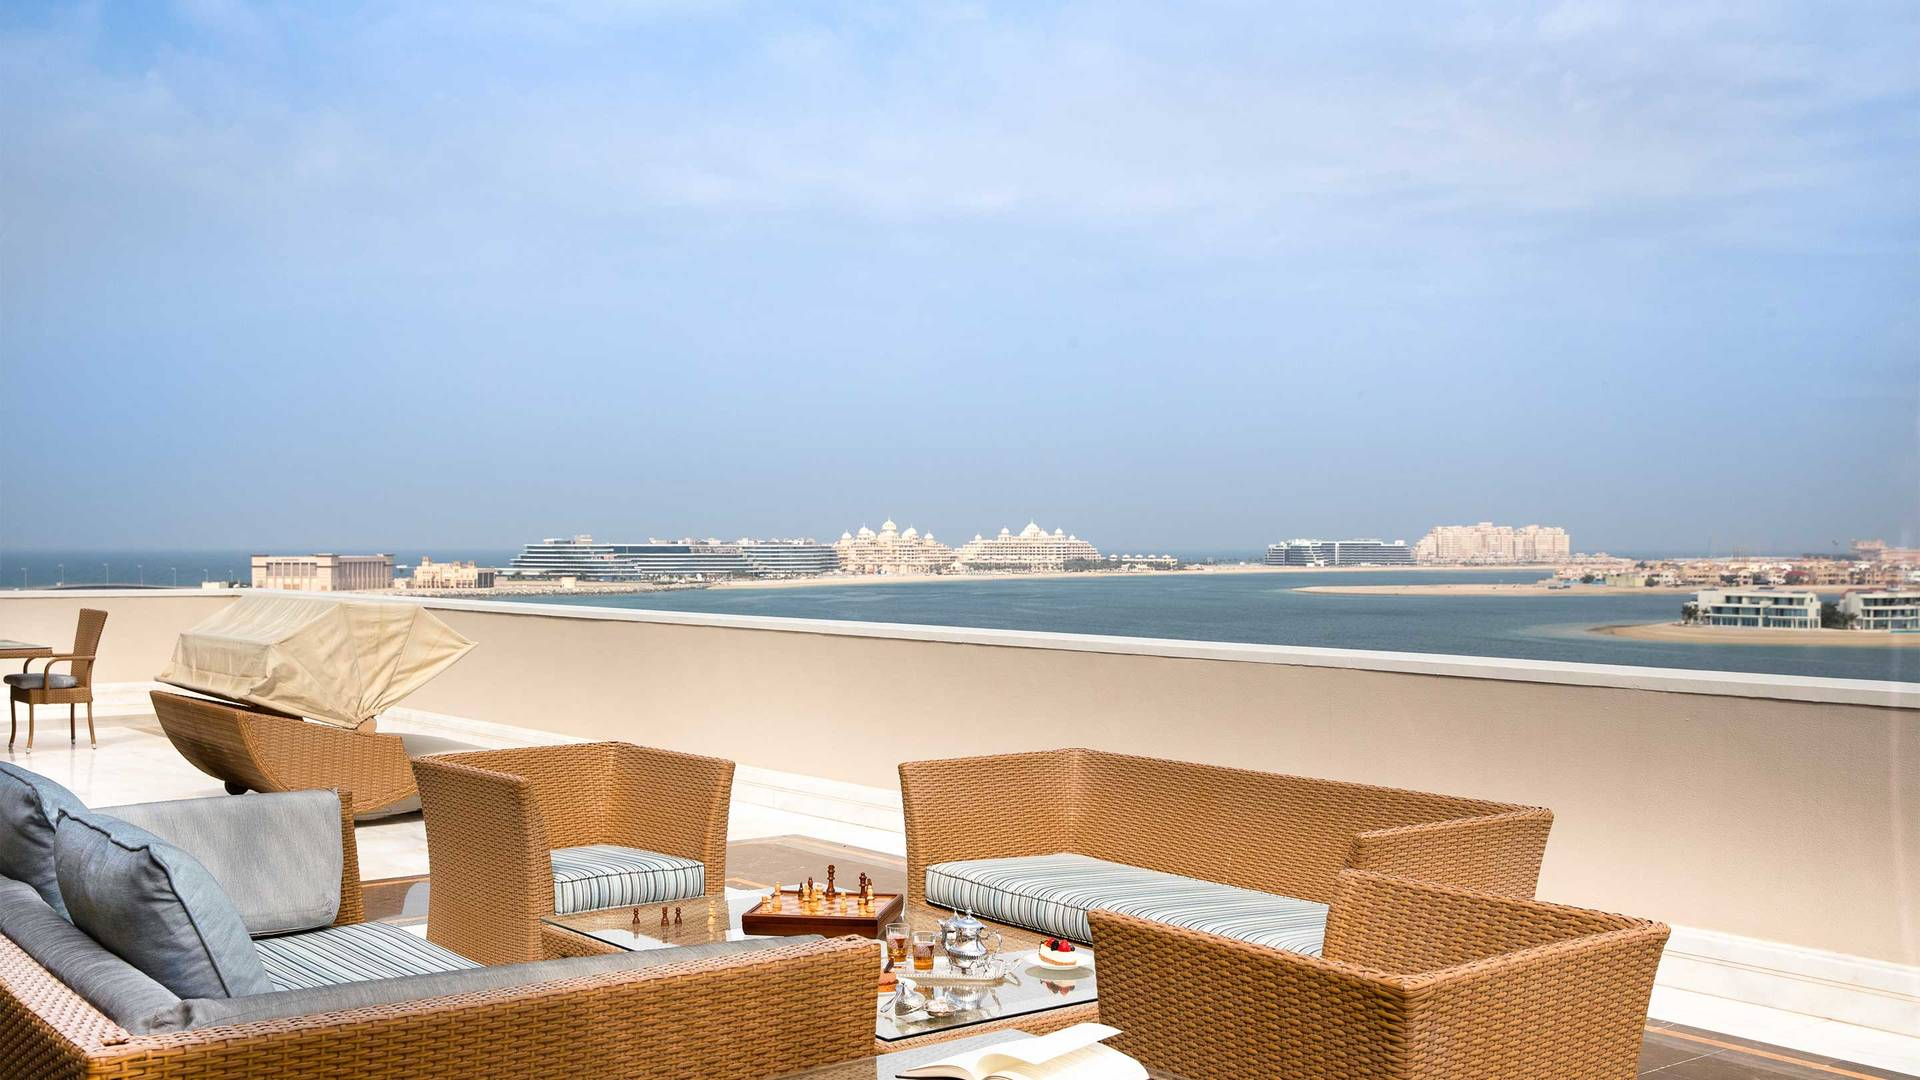 16-9_Jumeirah-Zabeel-Saray---Grand-Imperial-Suite---Terrace